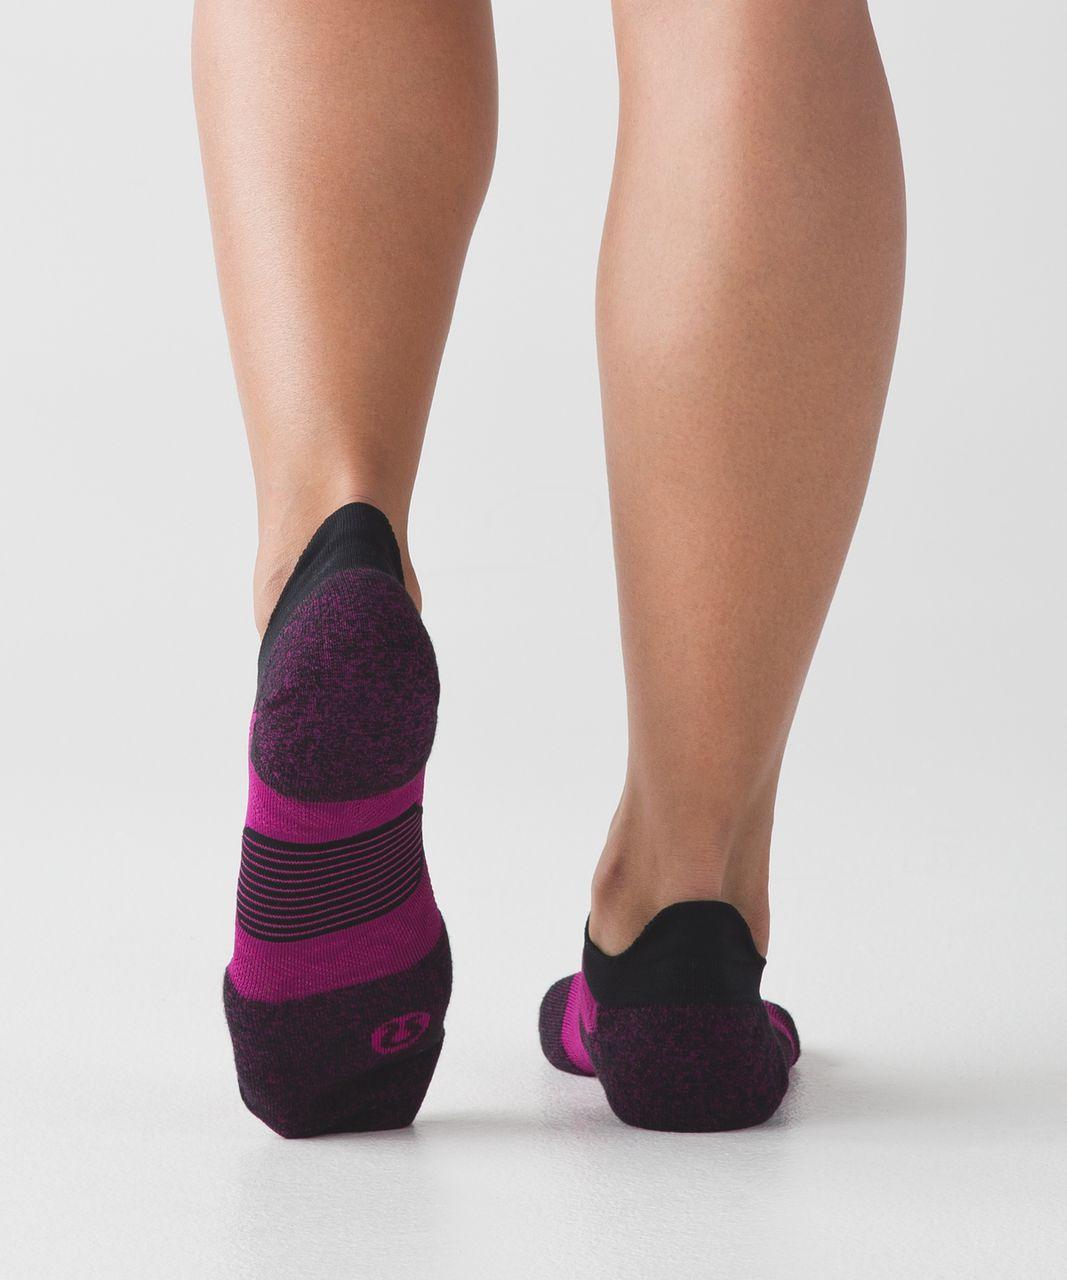 Lululemon High Speed Sock (Silver) - Deep Fuschia / Ripened Raspberry / Black